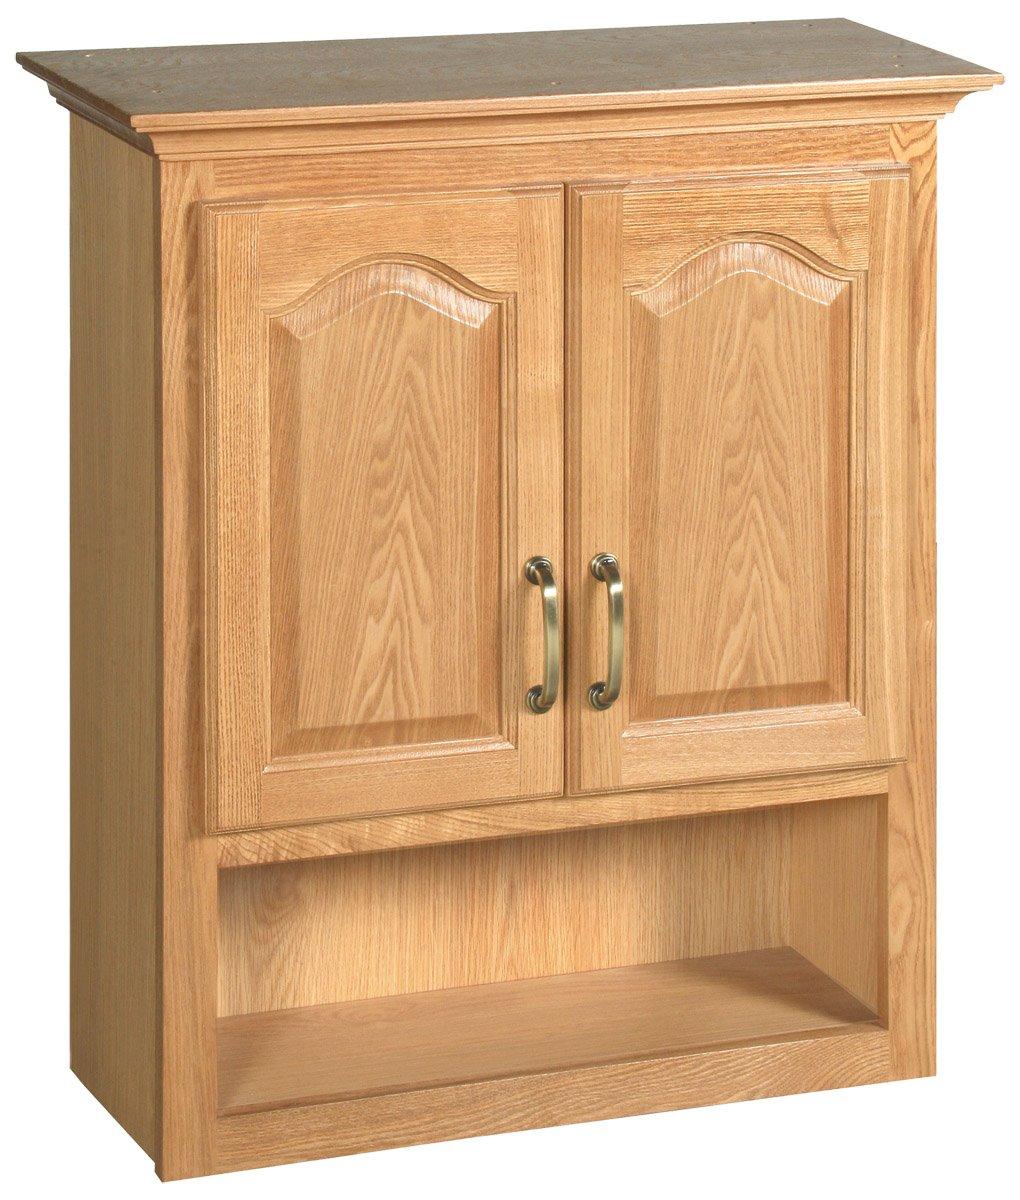 Amazon Design House 552844 26 Inch By 30 Inch Richland 2 Door